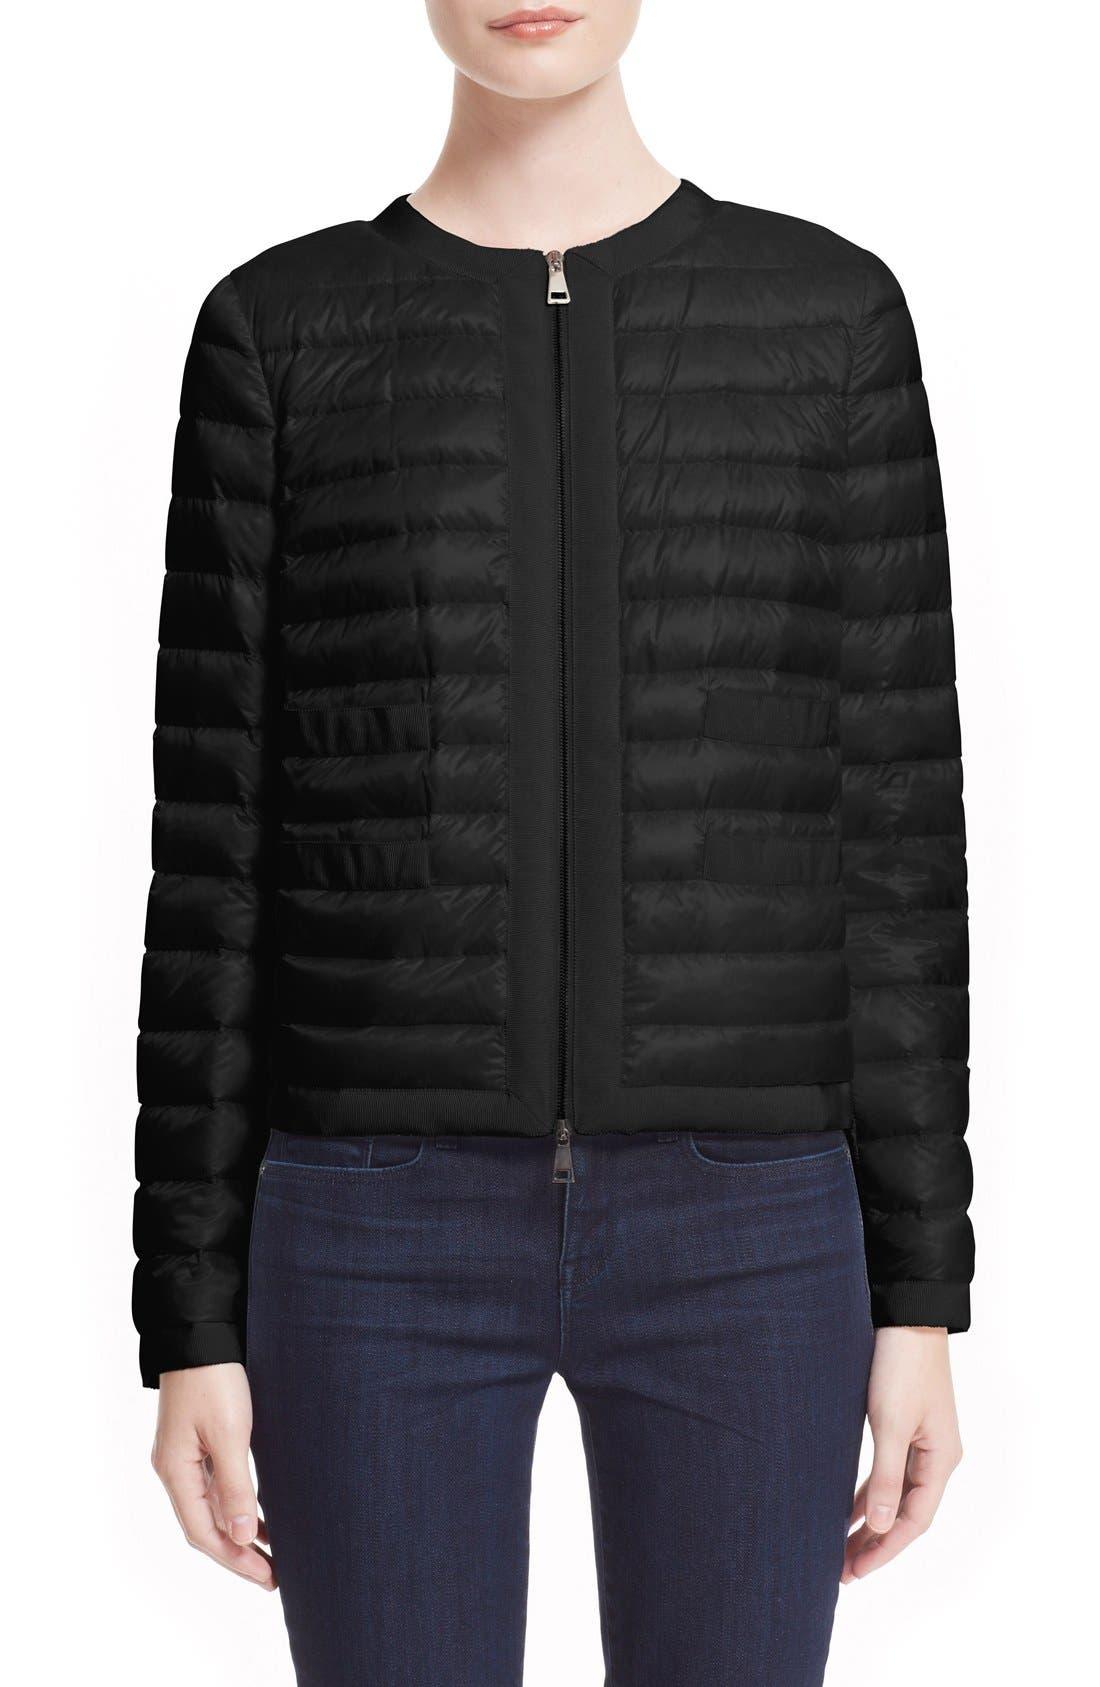 Moncler 'Alose' Water Resistant Short Puffer Jacket